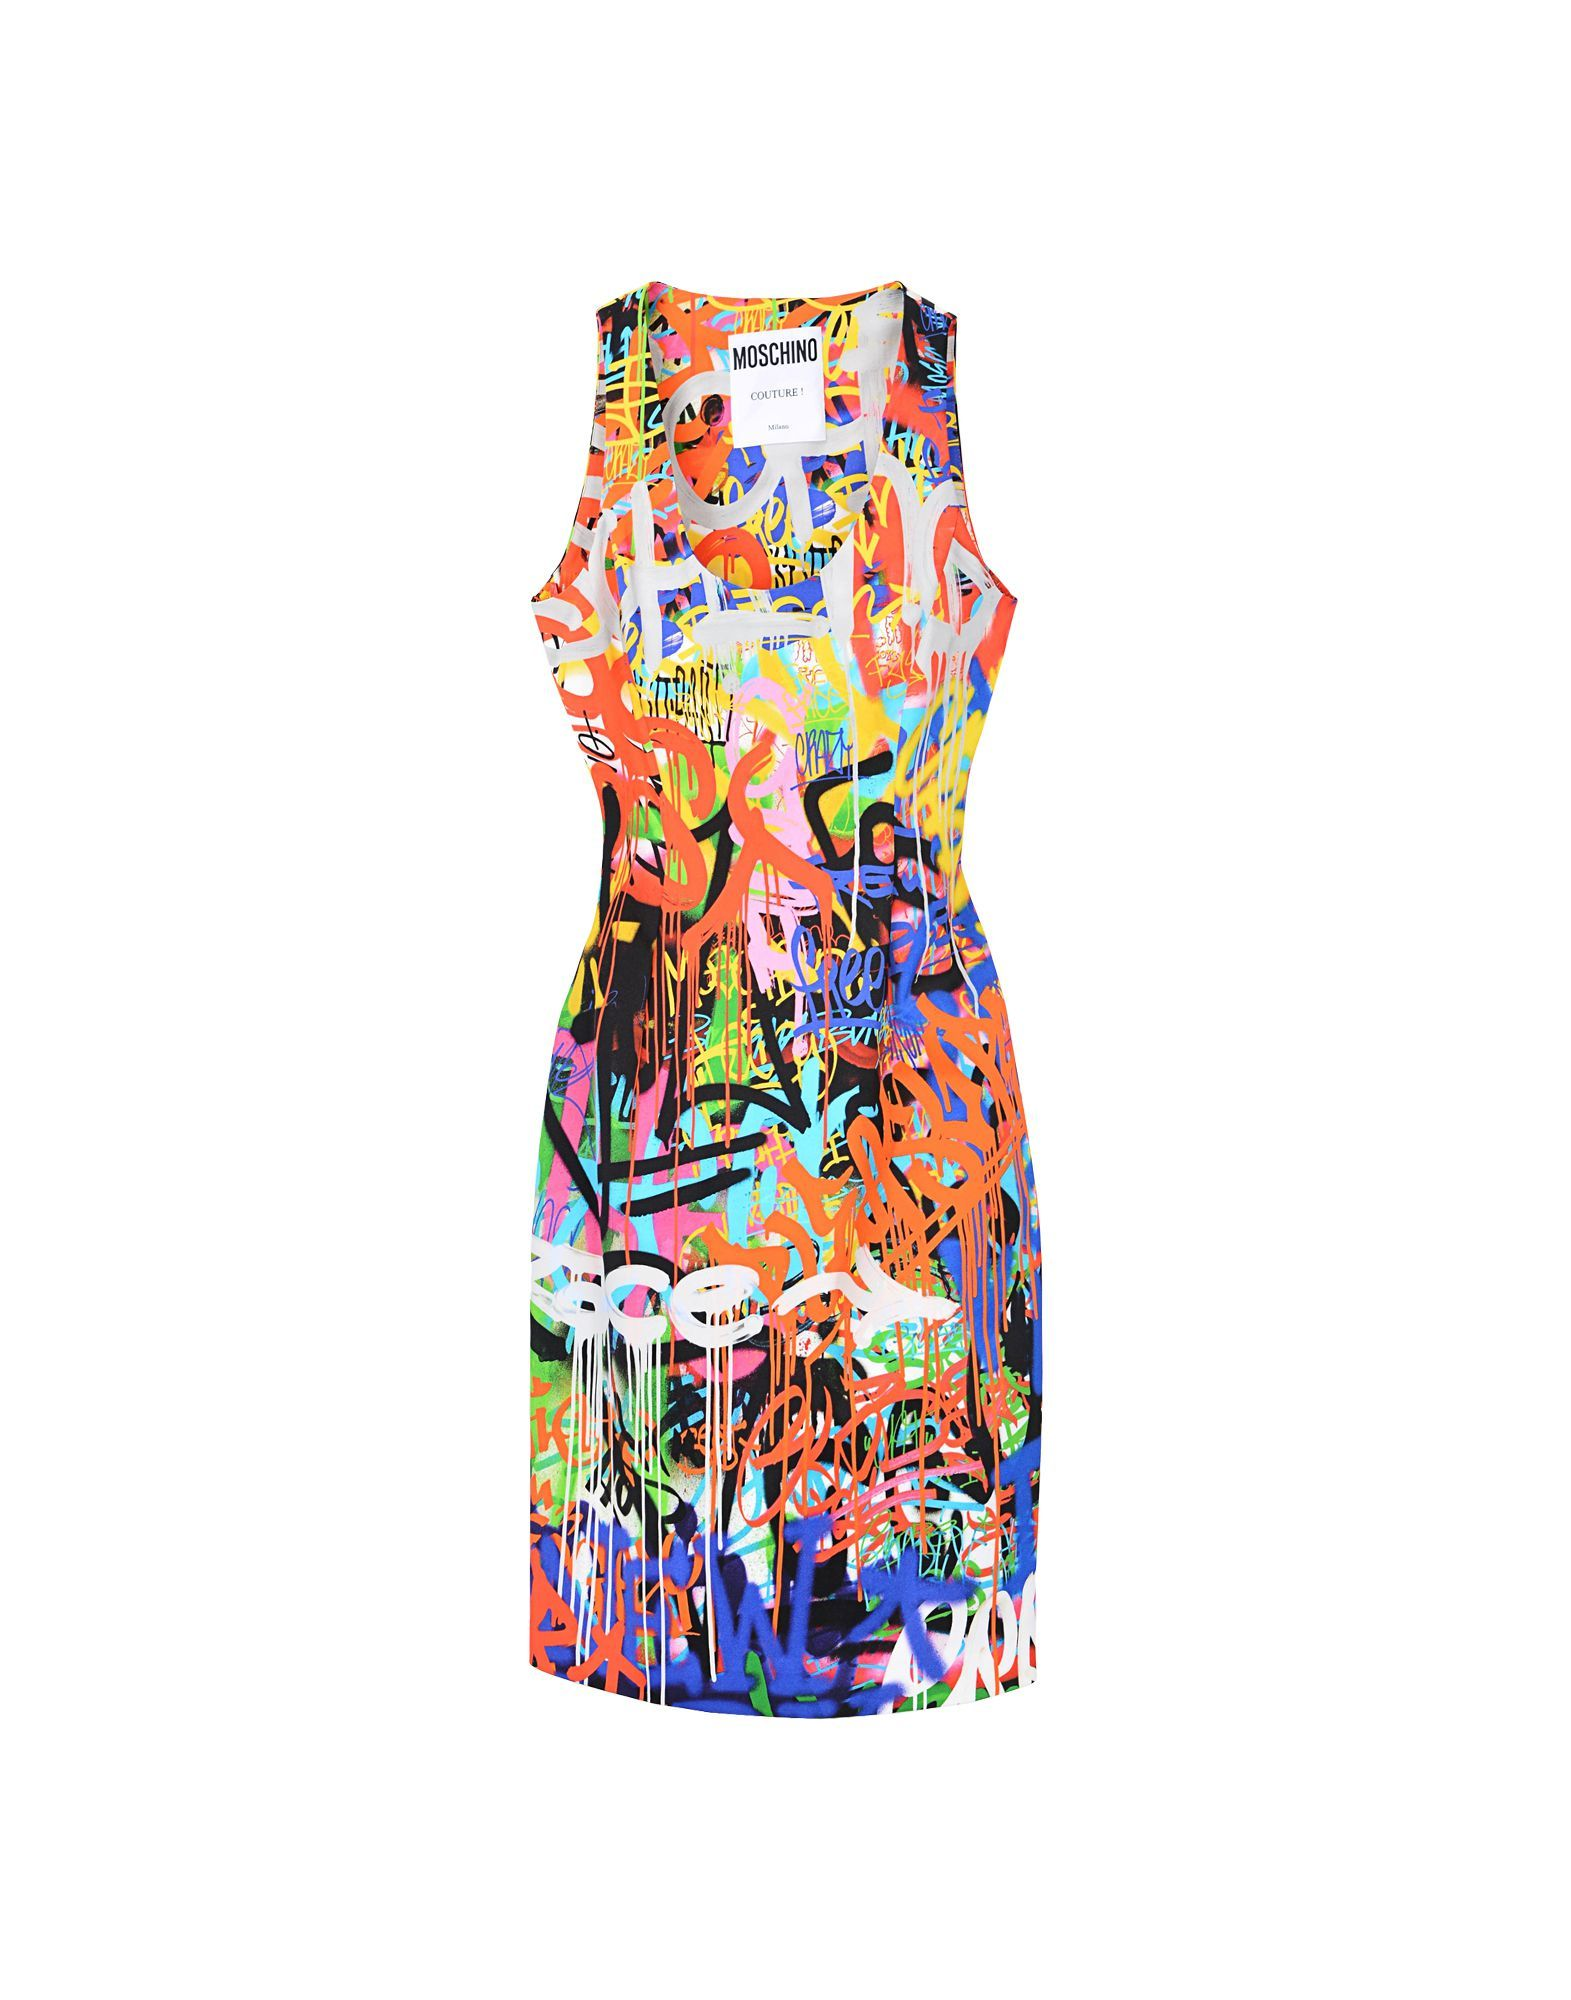 Short Dress Women - Moschino Online Store